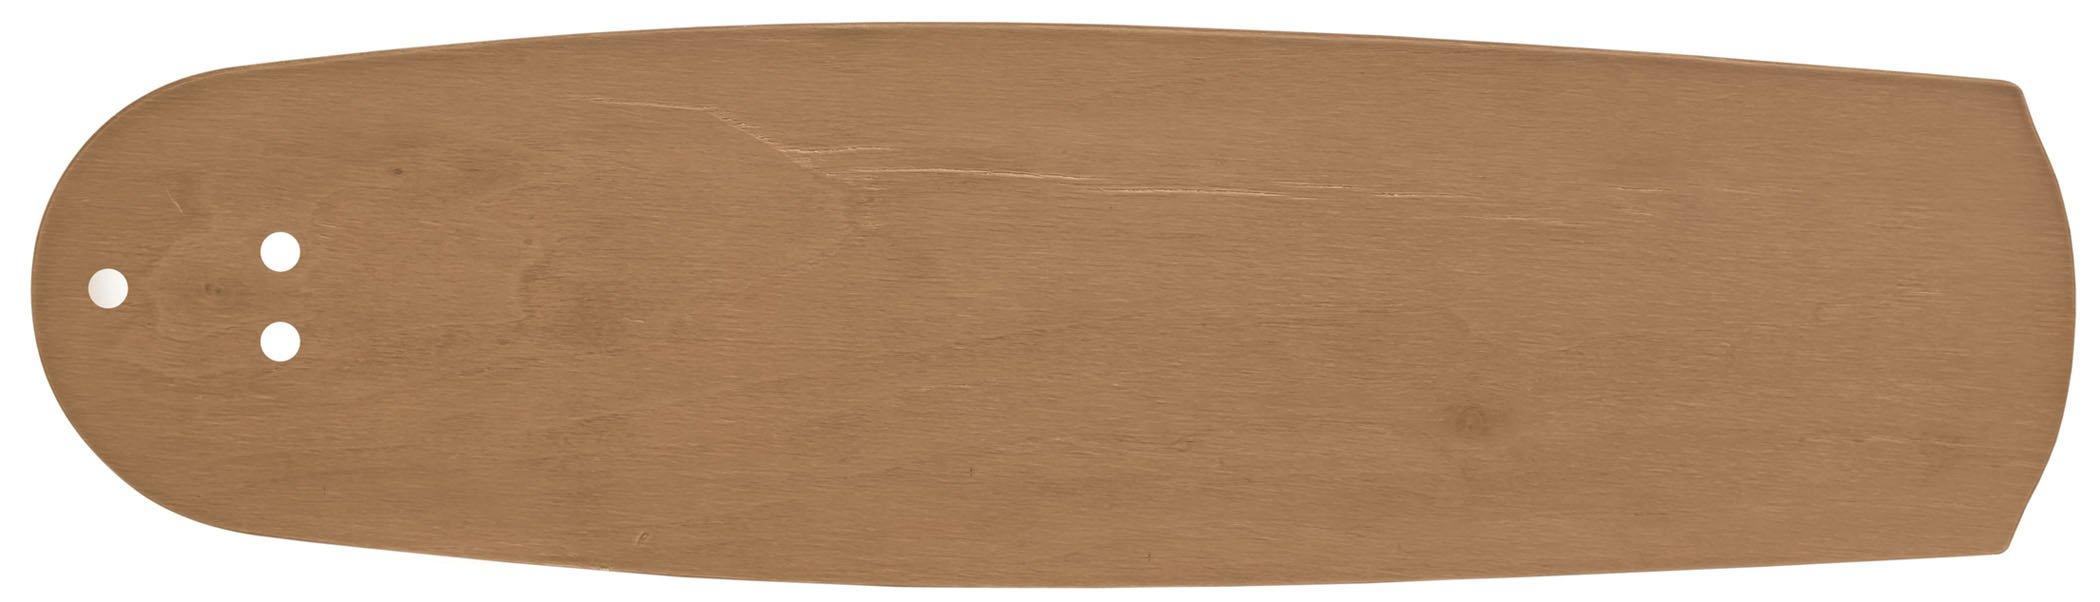 Casablanca 99175, Five Light Walnut Blades, 52-54'' Span